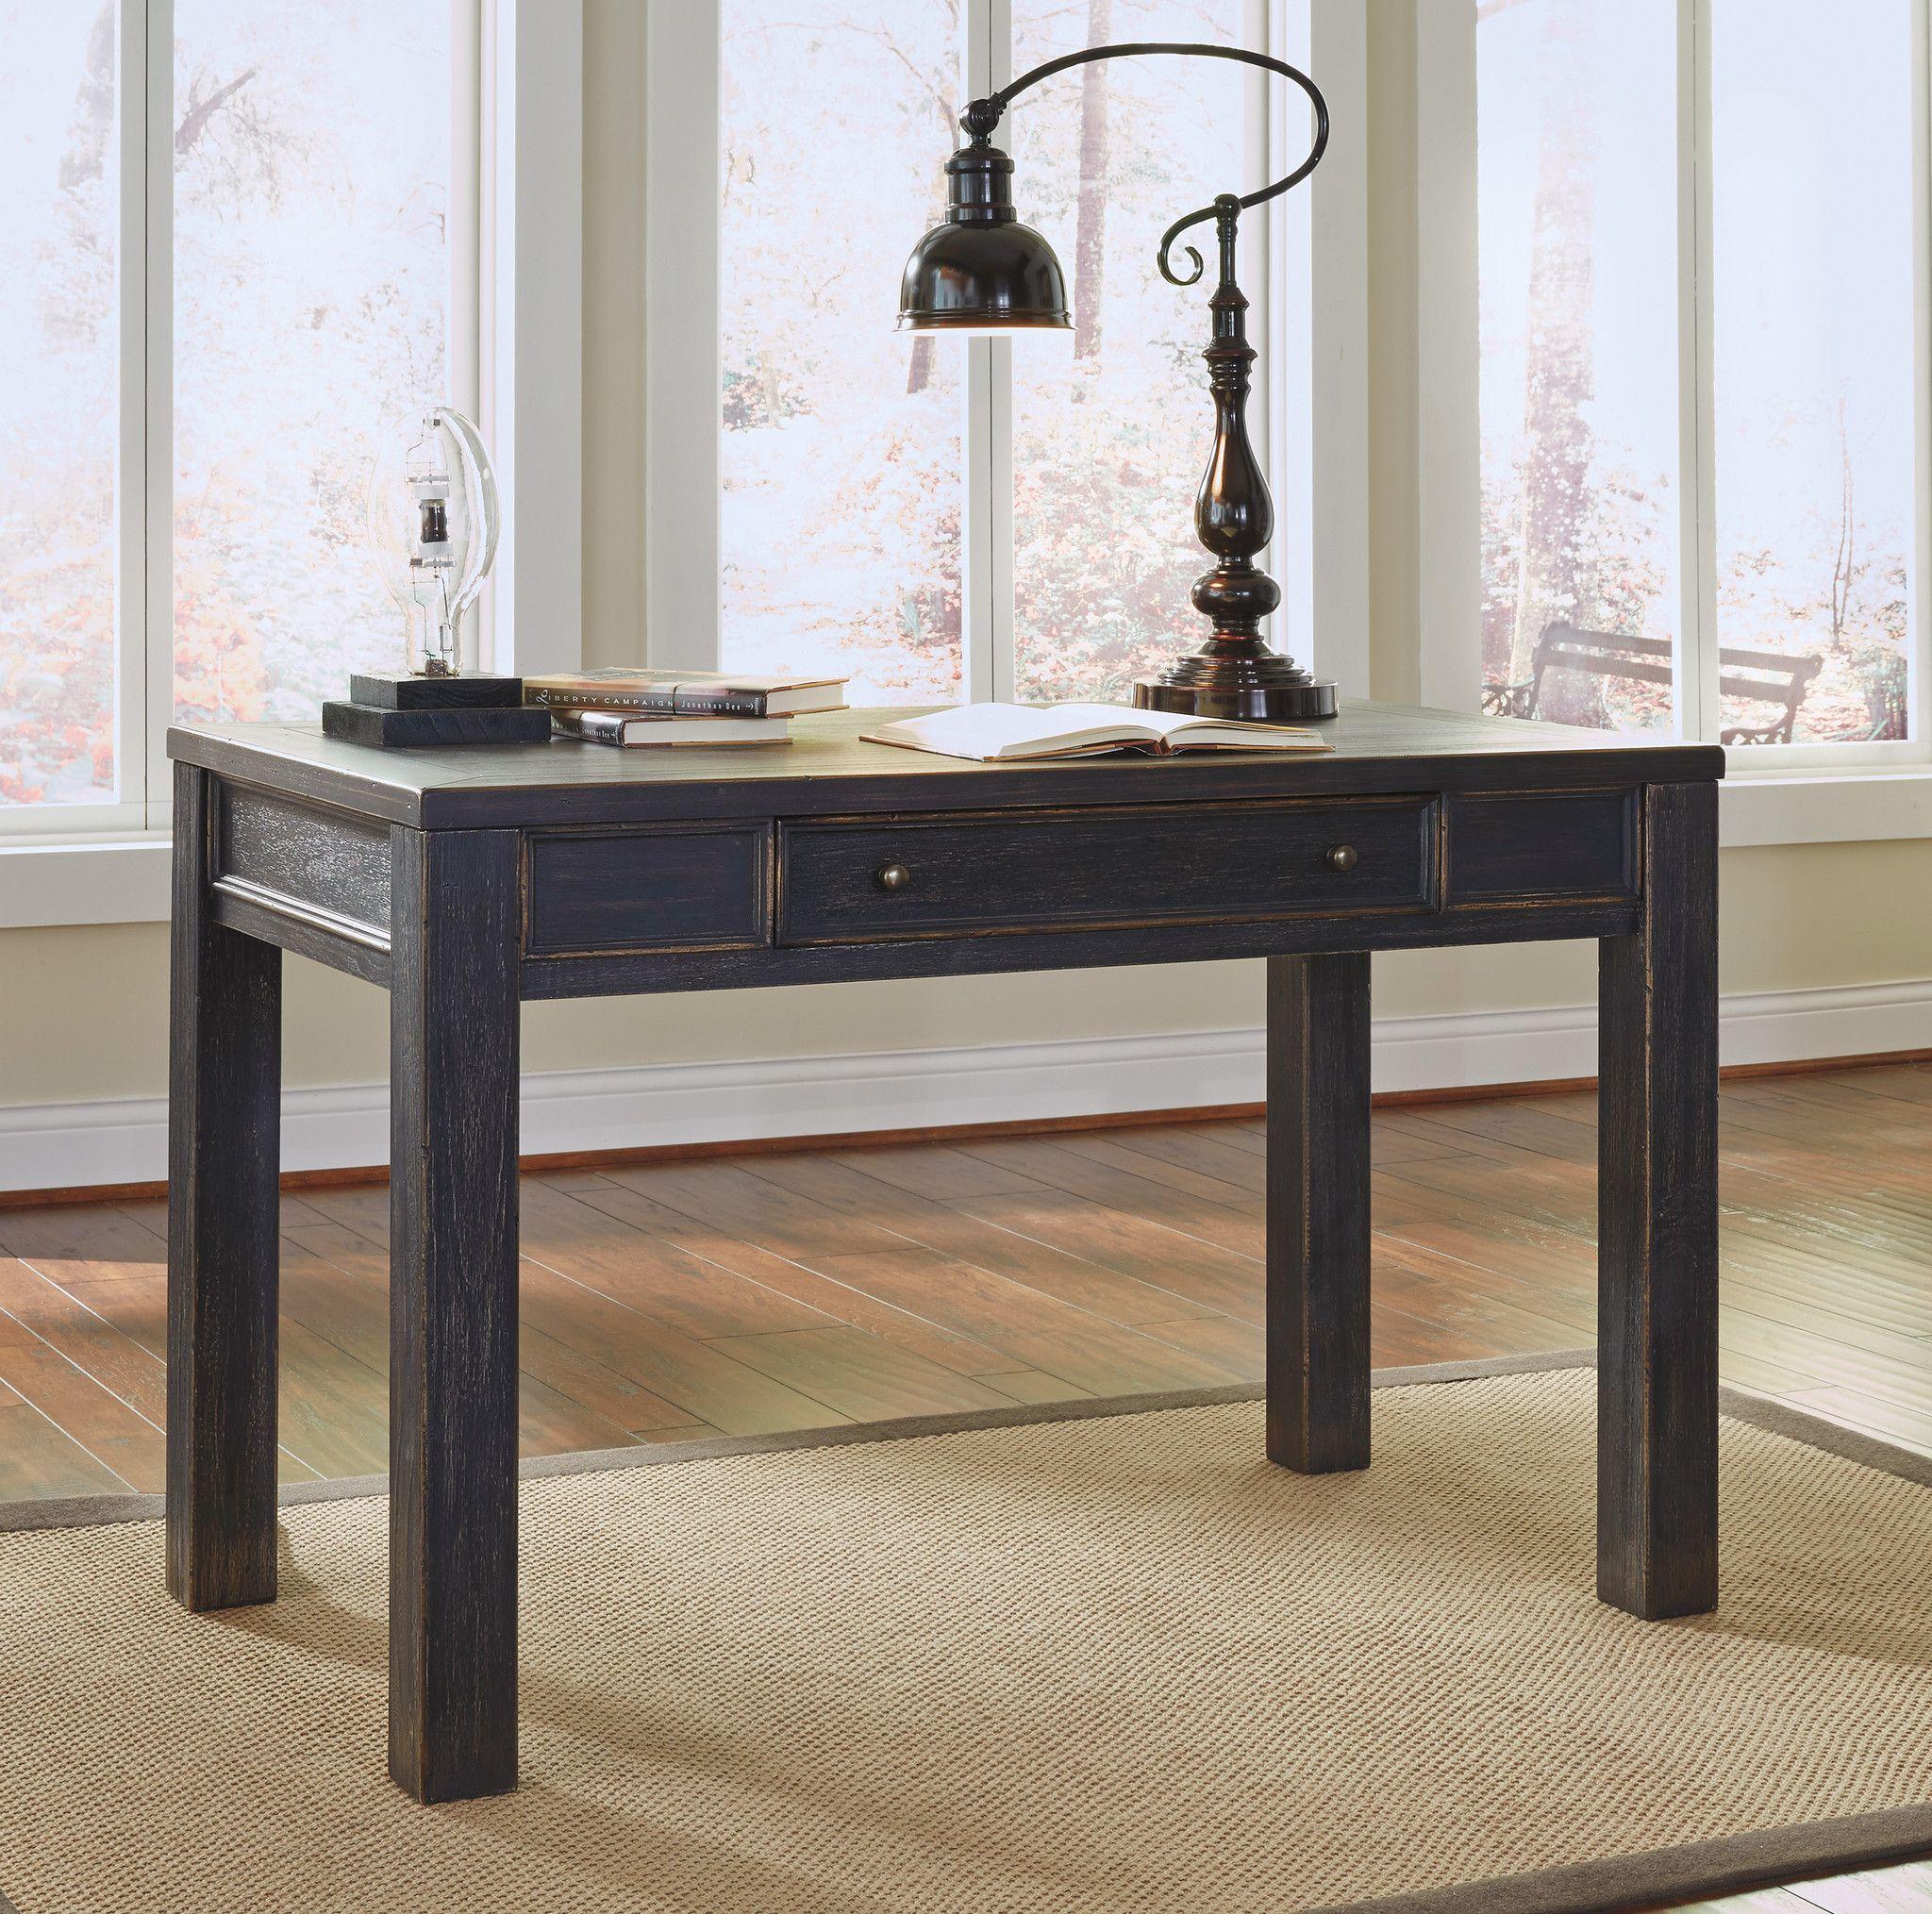 large desks for home office. Gavelston Home Office Large Leg Desk Desks For R